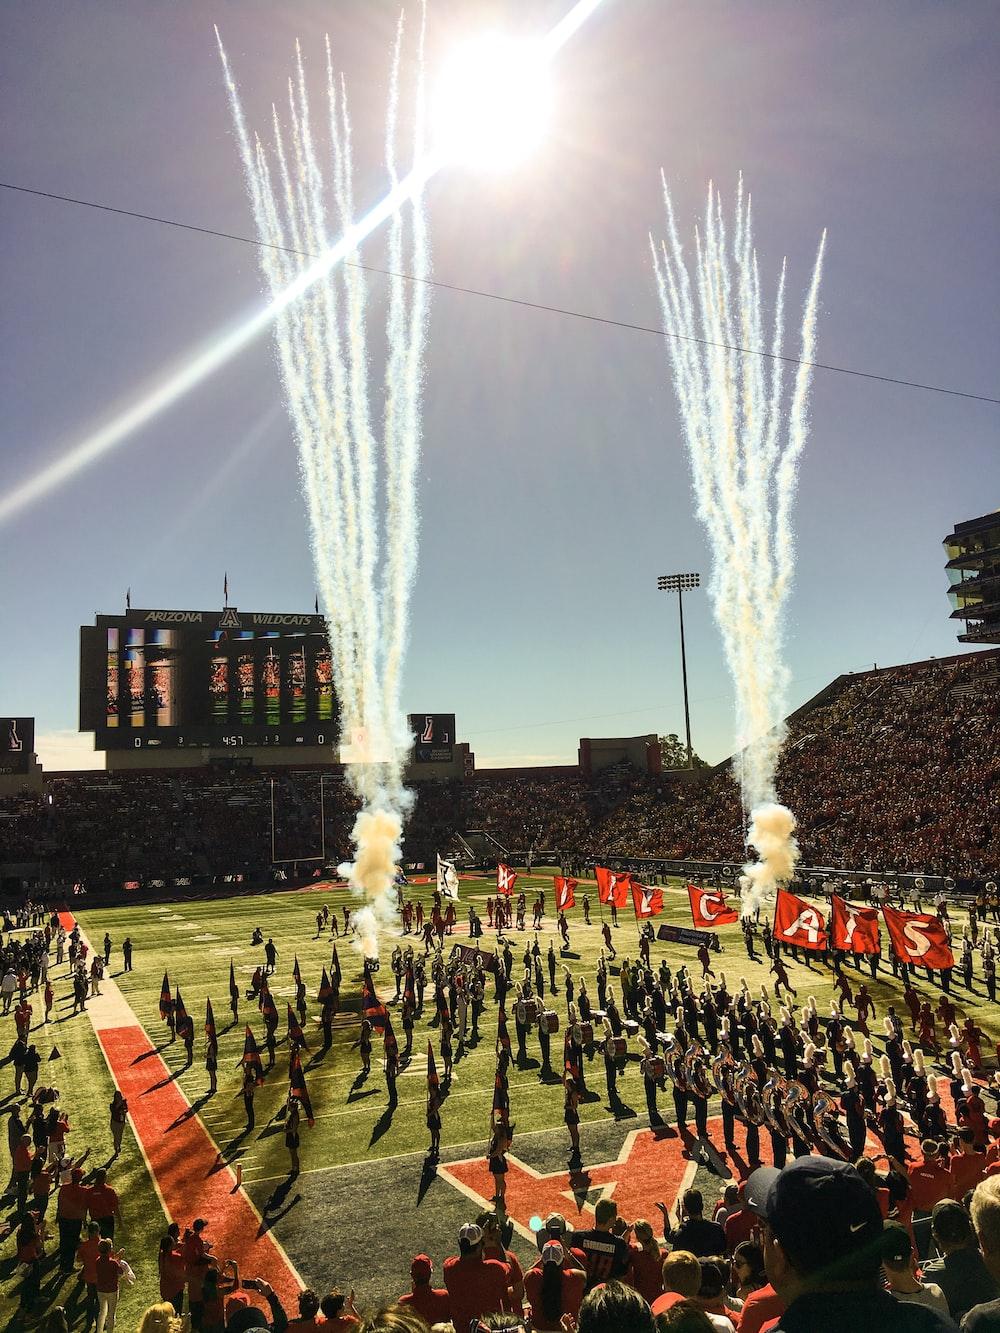 people standing at stadium